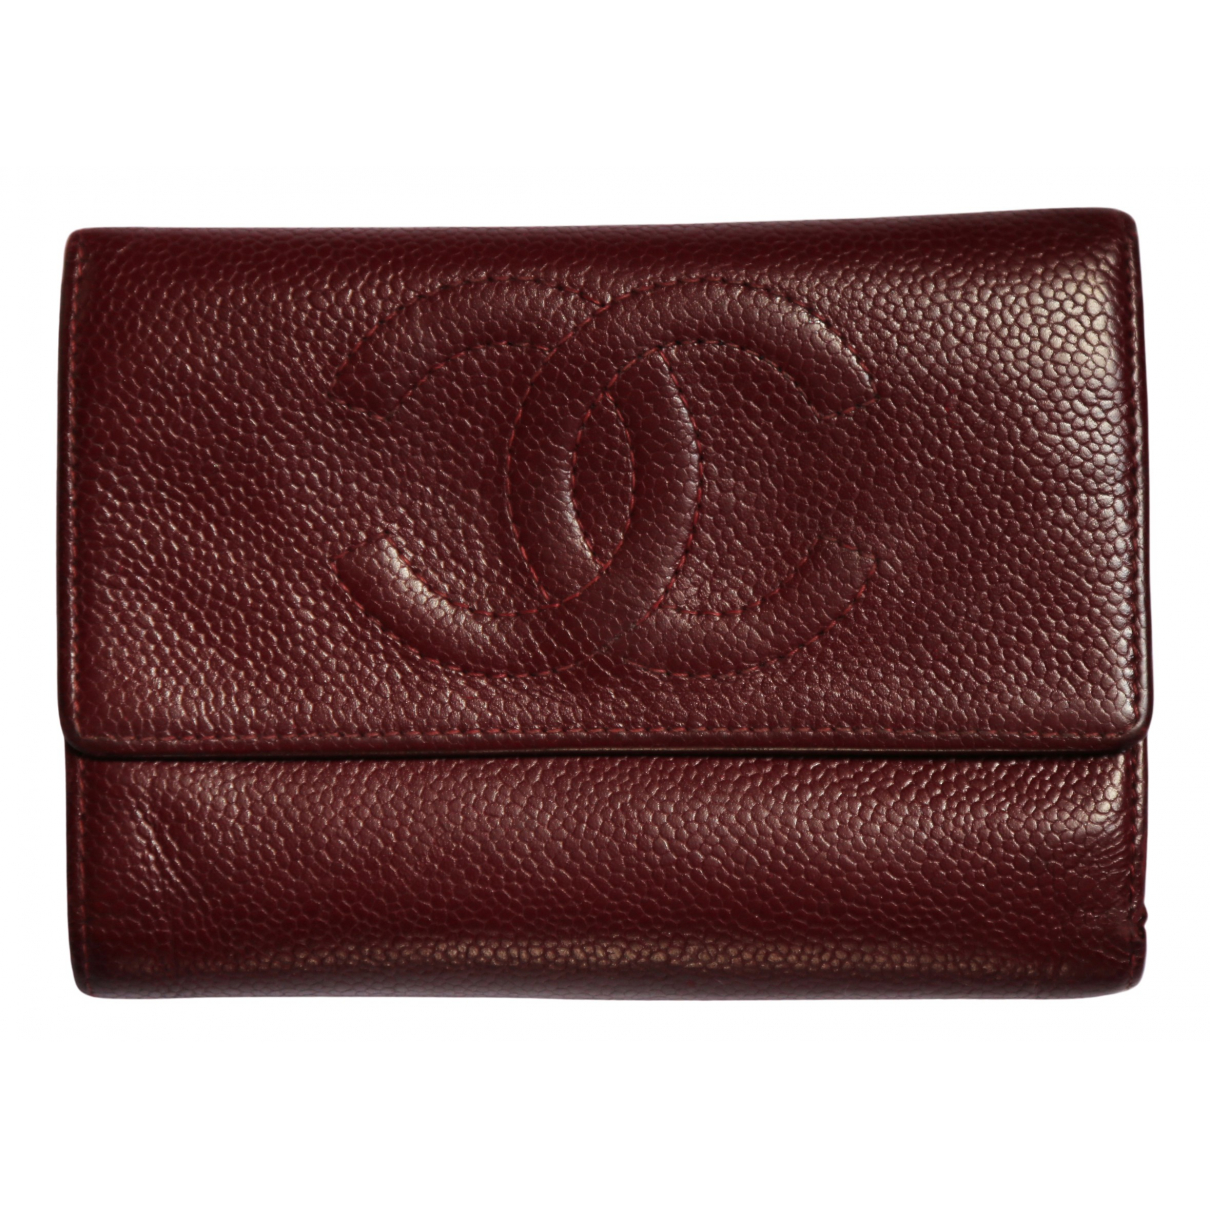 Chanel N Burgundy Leather wallet for Women N